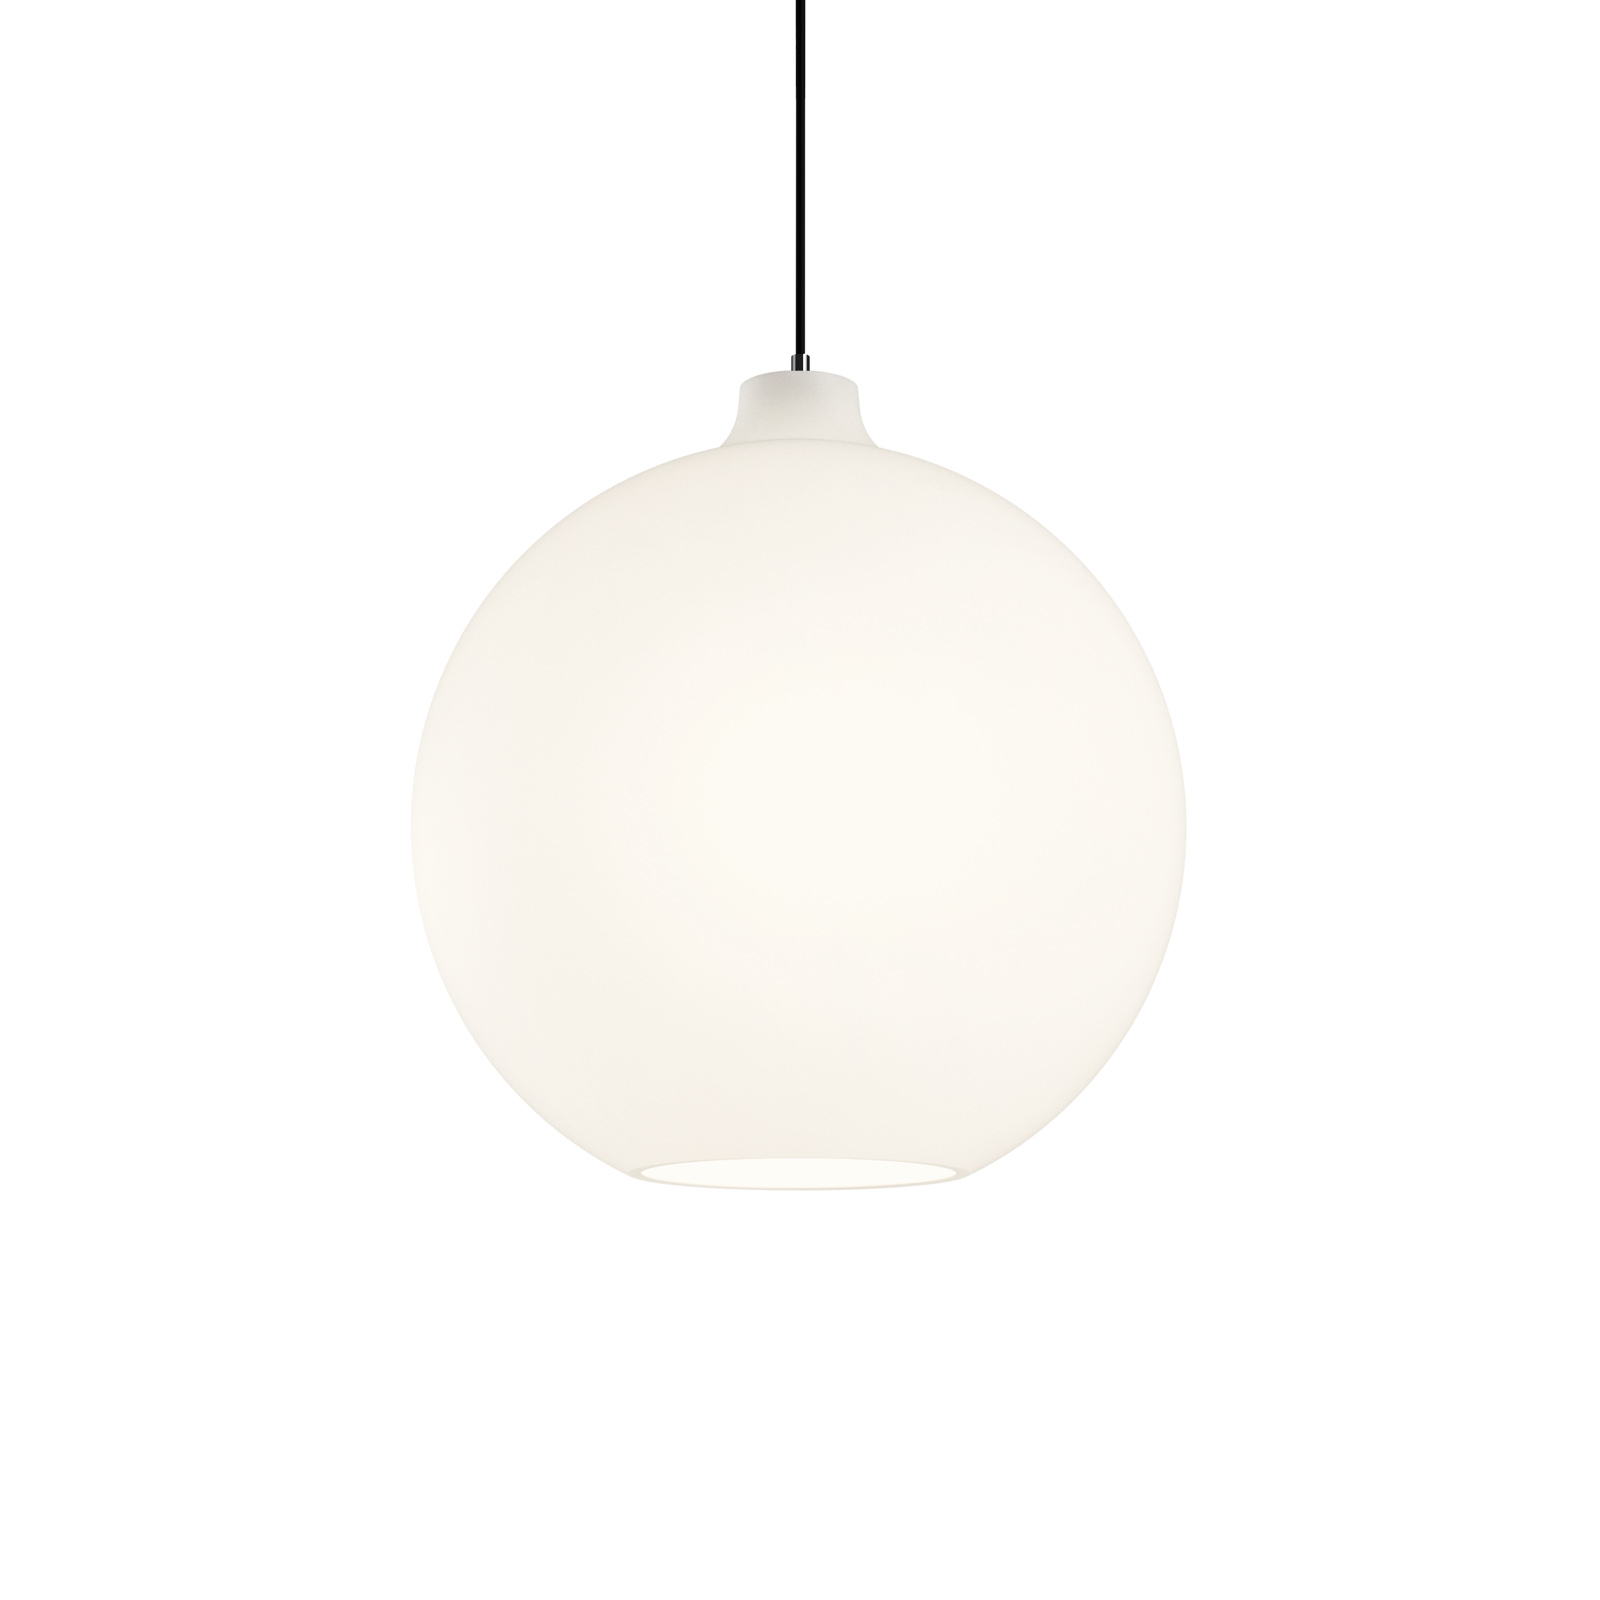 Louis Poulsen Wohlert glas-hanglamp Ø 35 cm